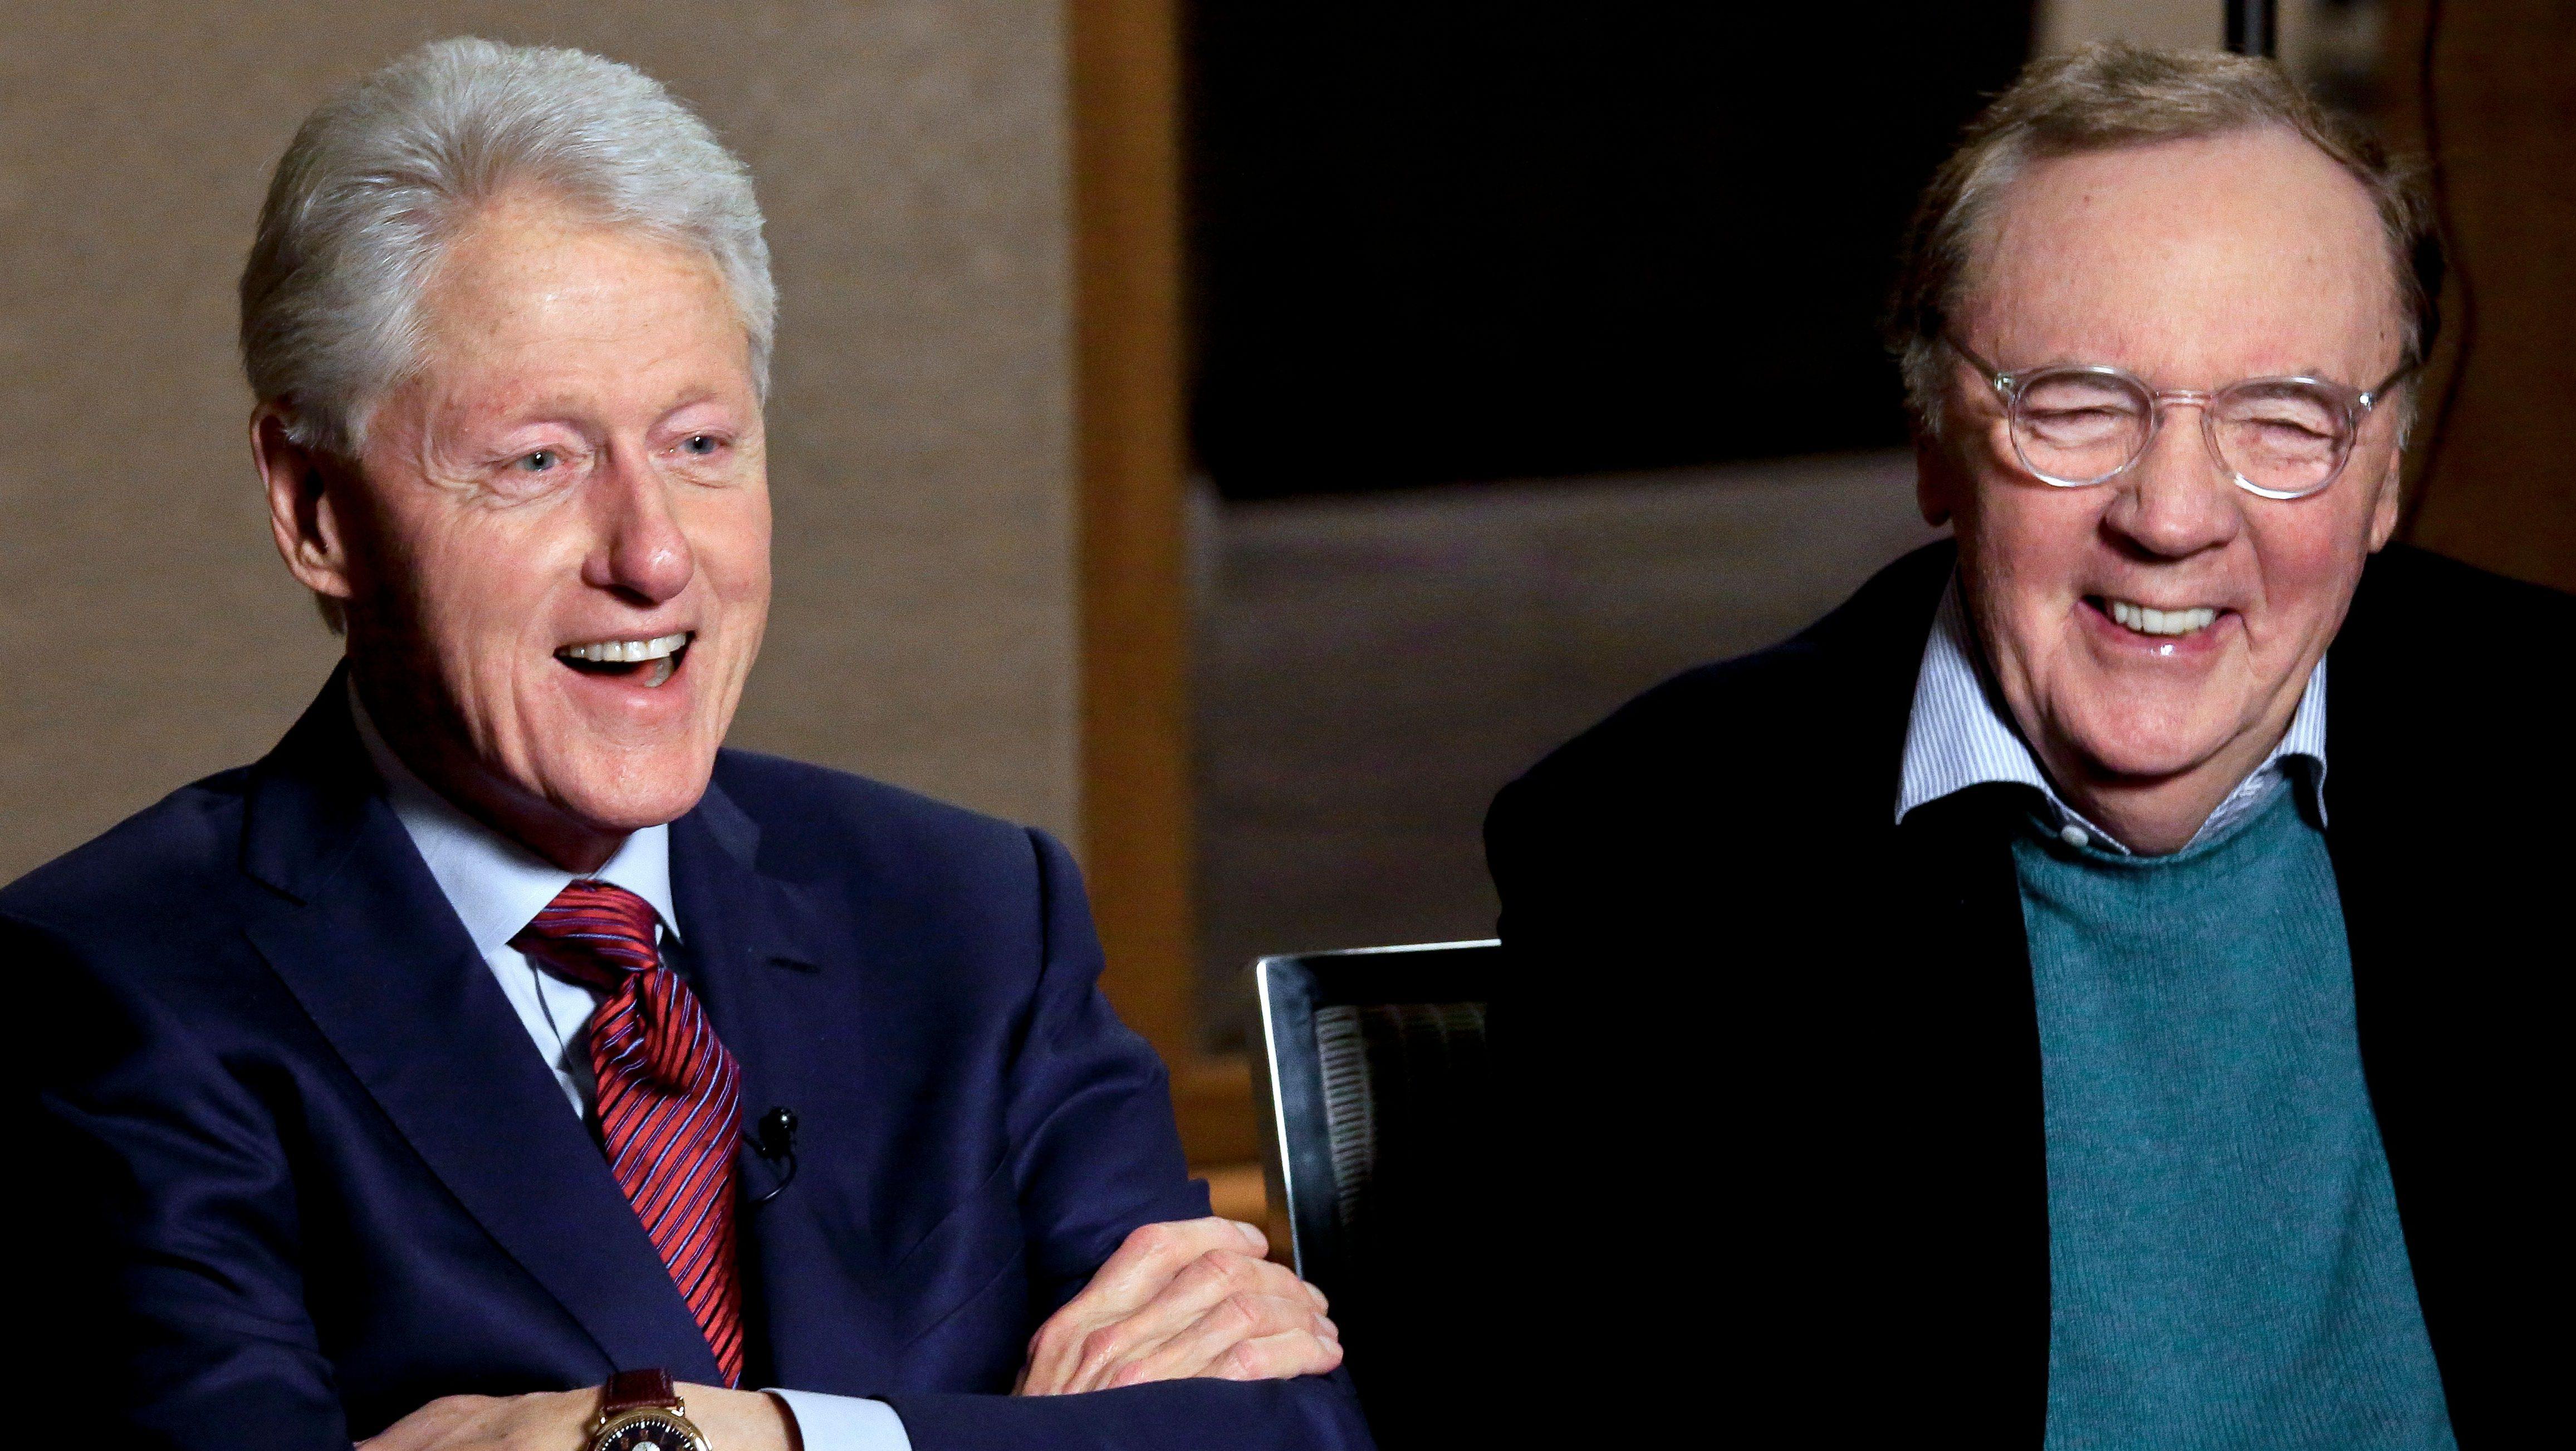 Bill Clinton, James Patterson book